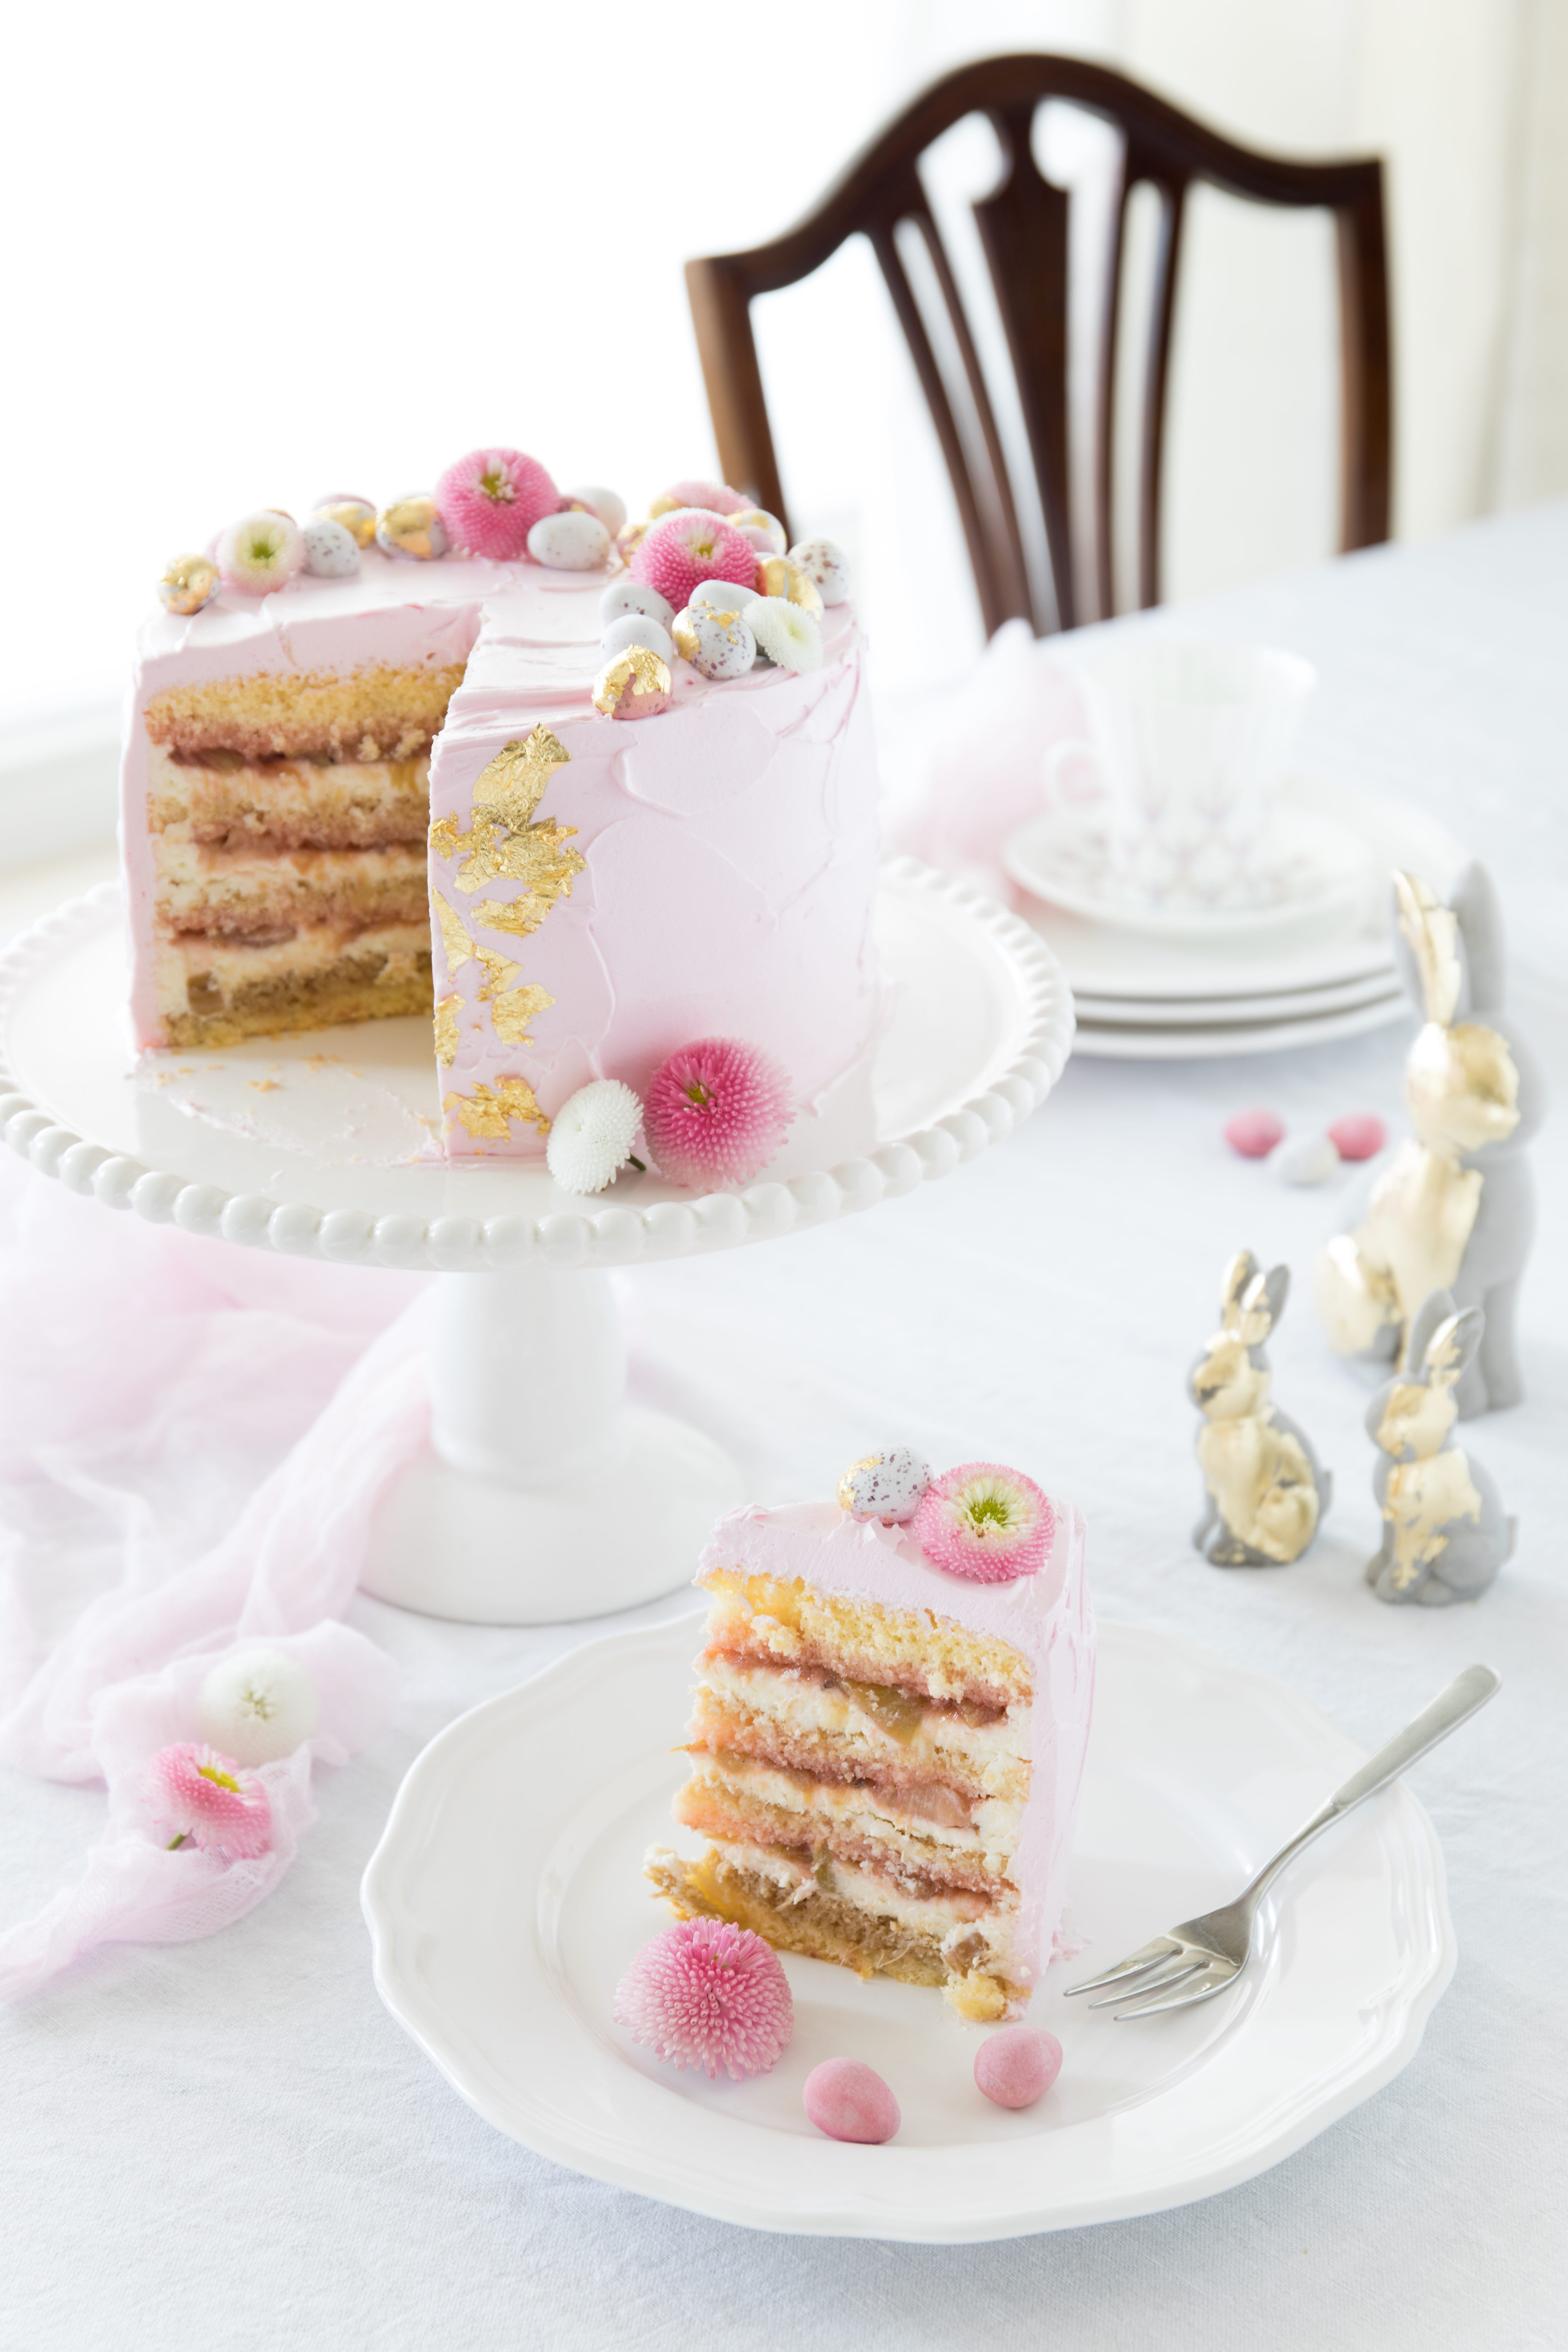 Oster Rezept: Himbeer Rhabarber Tiramisu Torte backen Ostertorte Ostern Cakestyling #ostern #torte #cake #backen #easter #cakestyling | Emma´s Lieblingsstücke